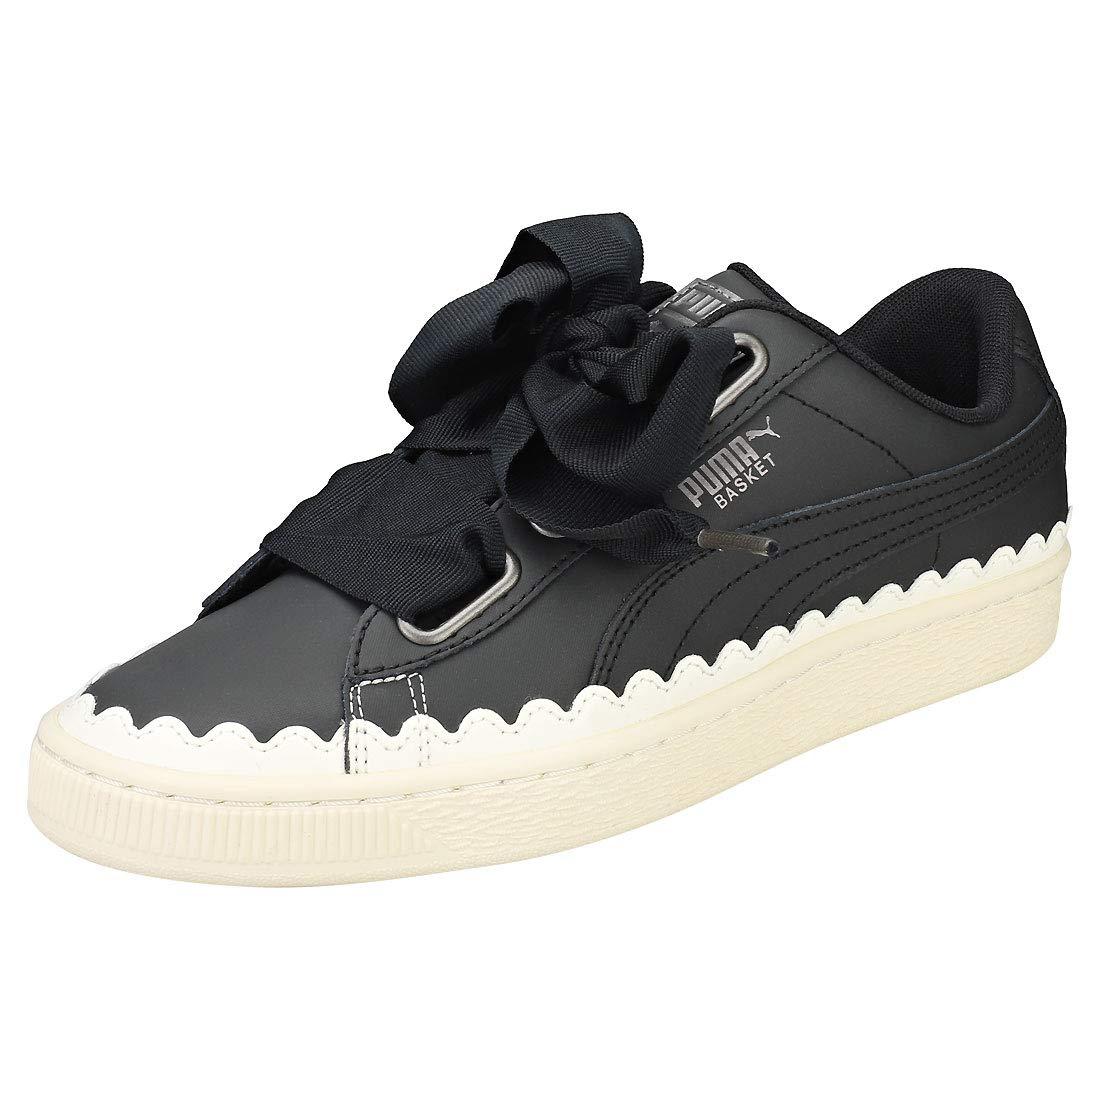 Buy Puma Women's Black Leather Sneakers